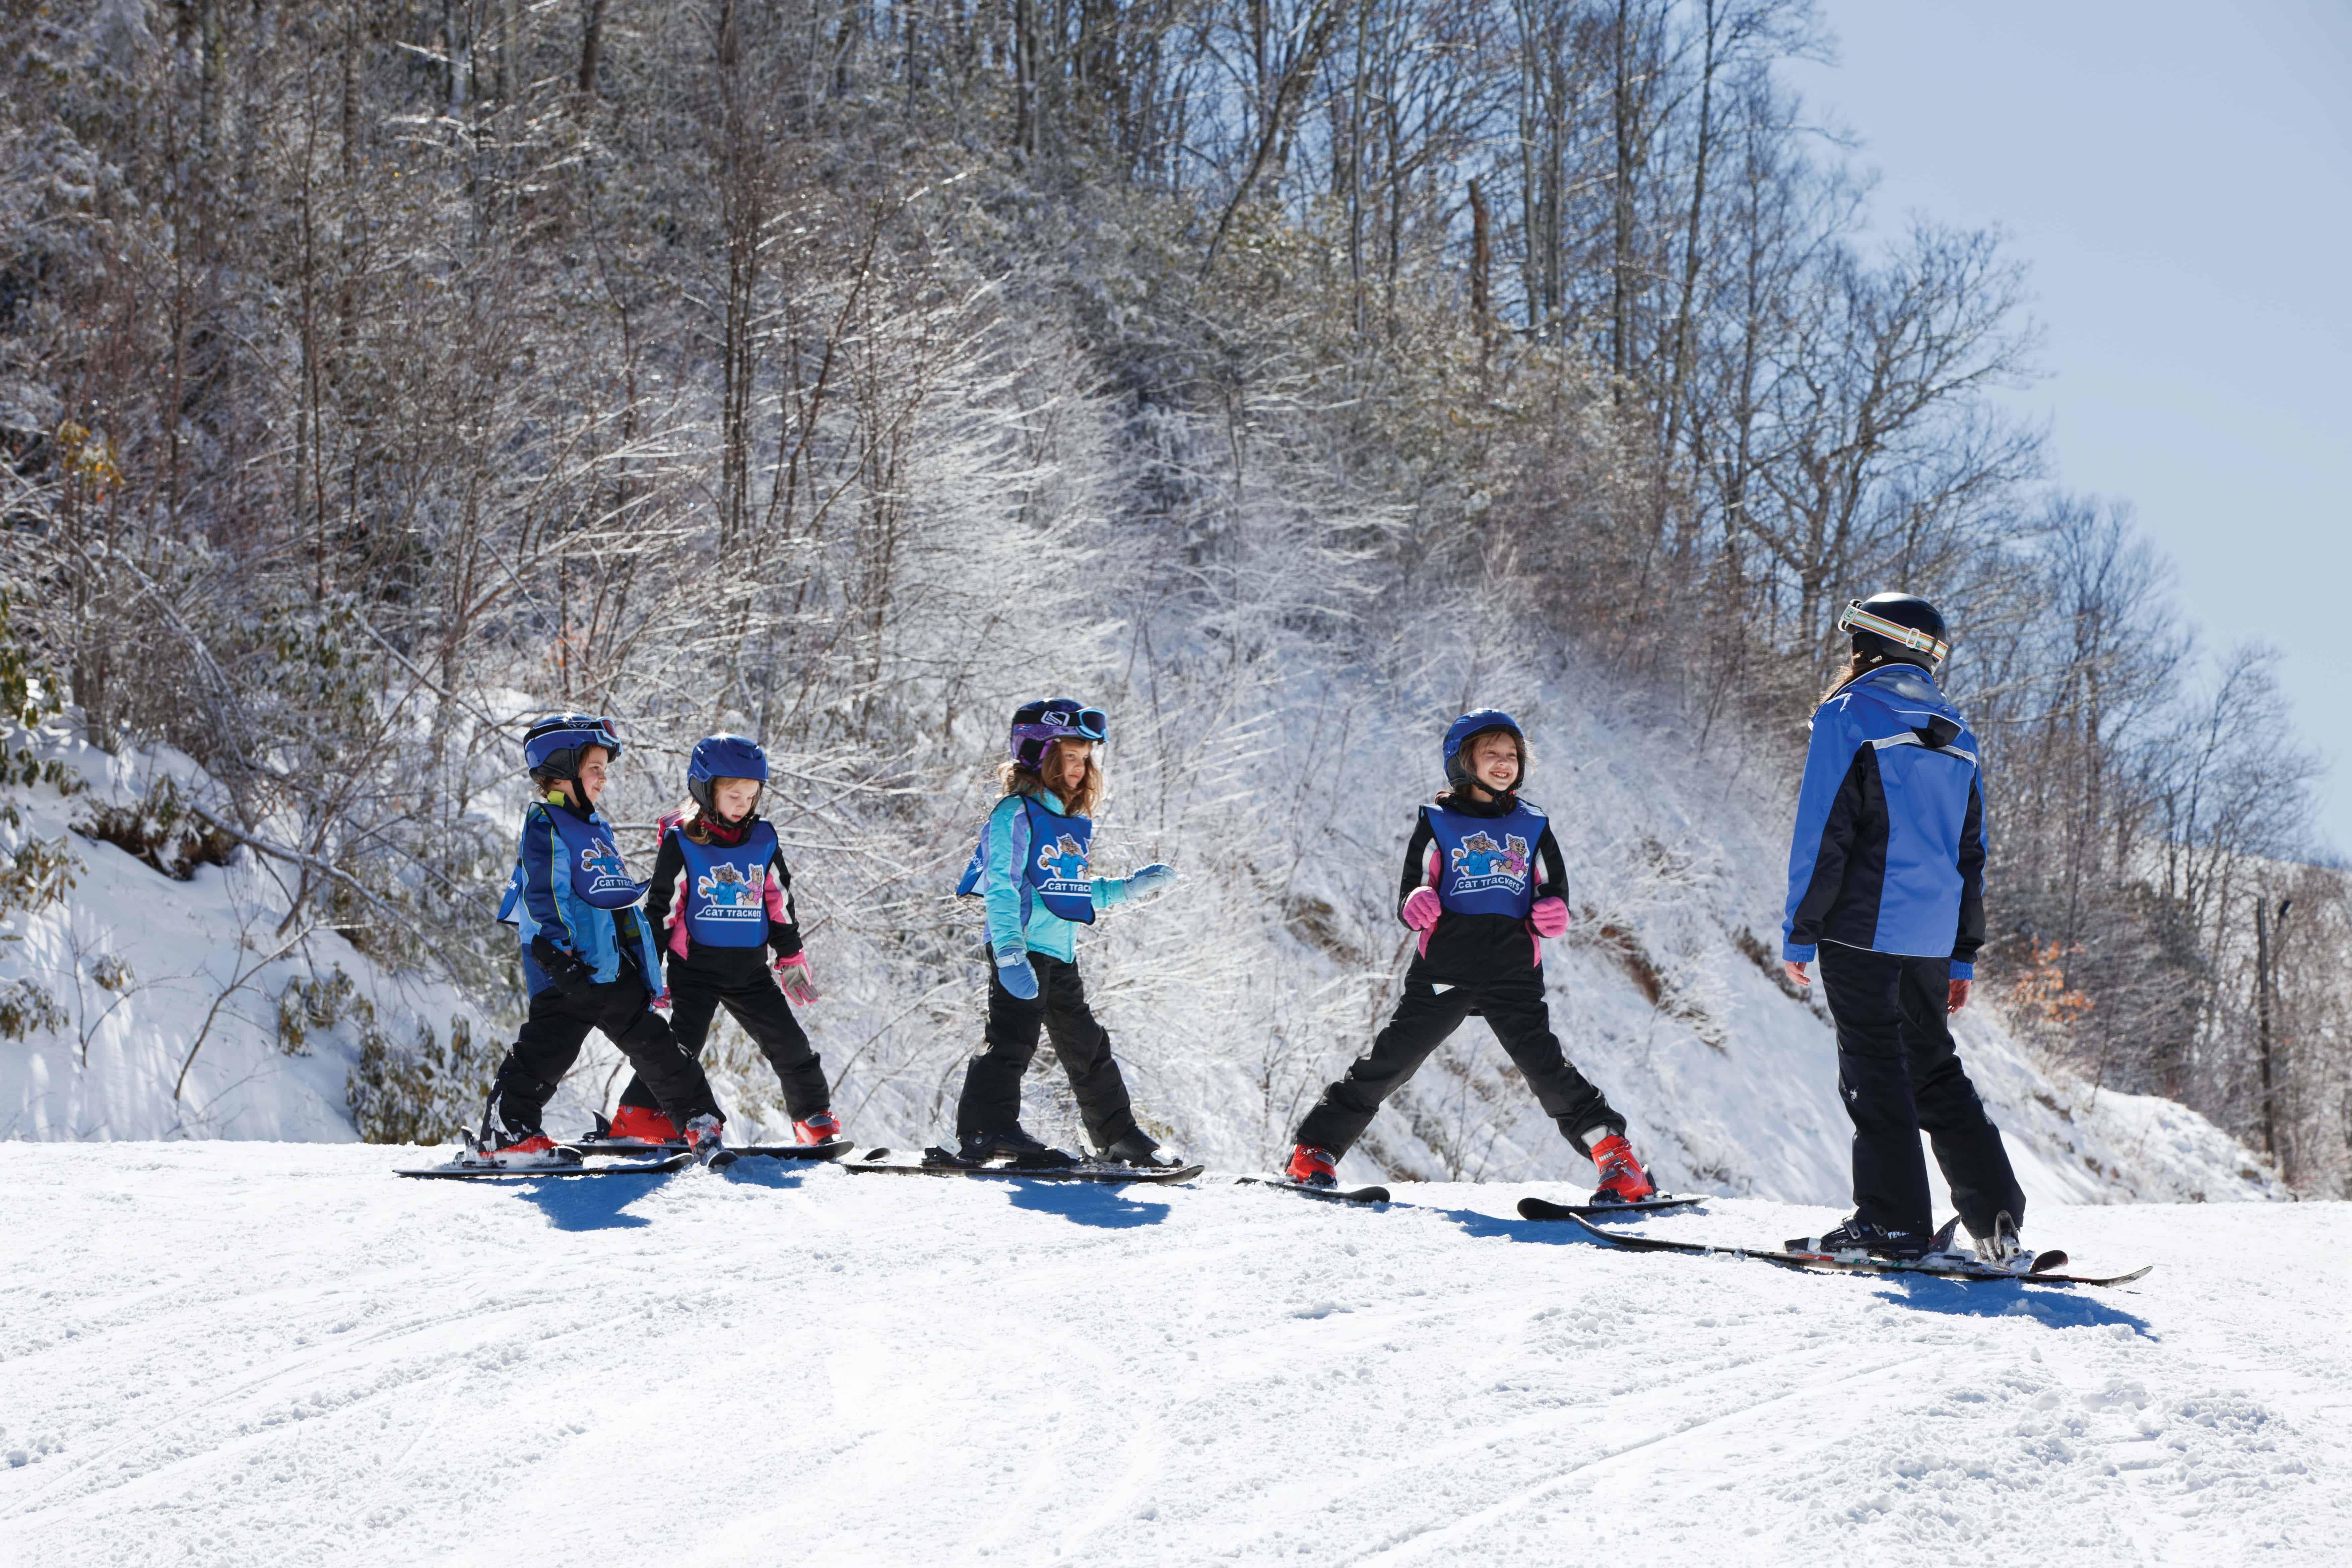 Ski_School_Bunny_Hill_1